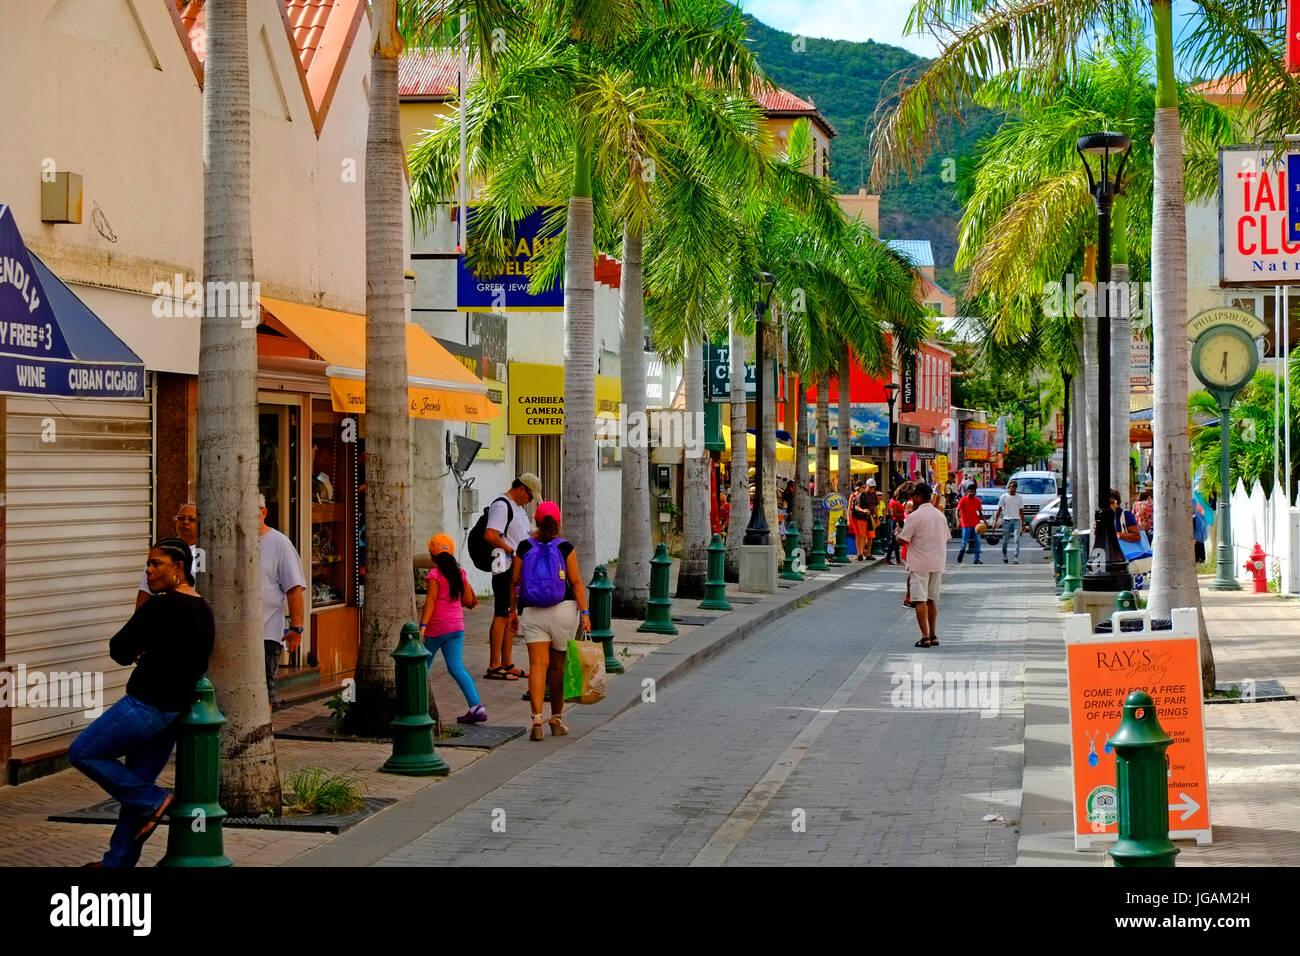 St Maarten Caribbean Cruise Celebrity line Island Vista Southern Caribbean Island Cruise from Miami Florida - Stock Image